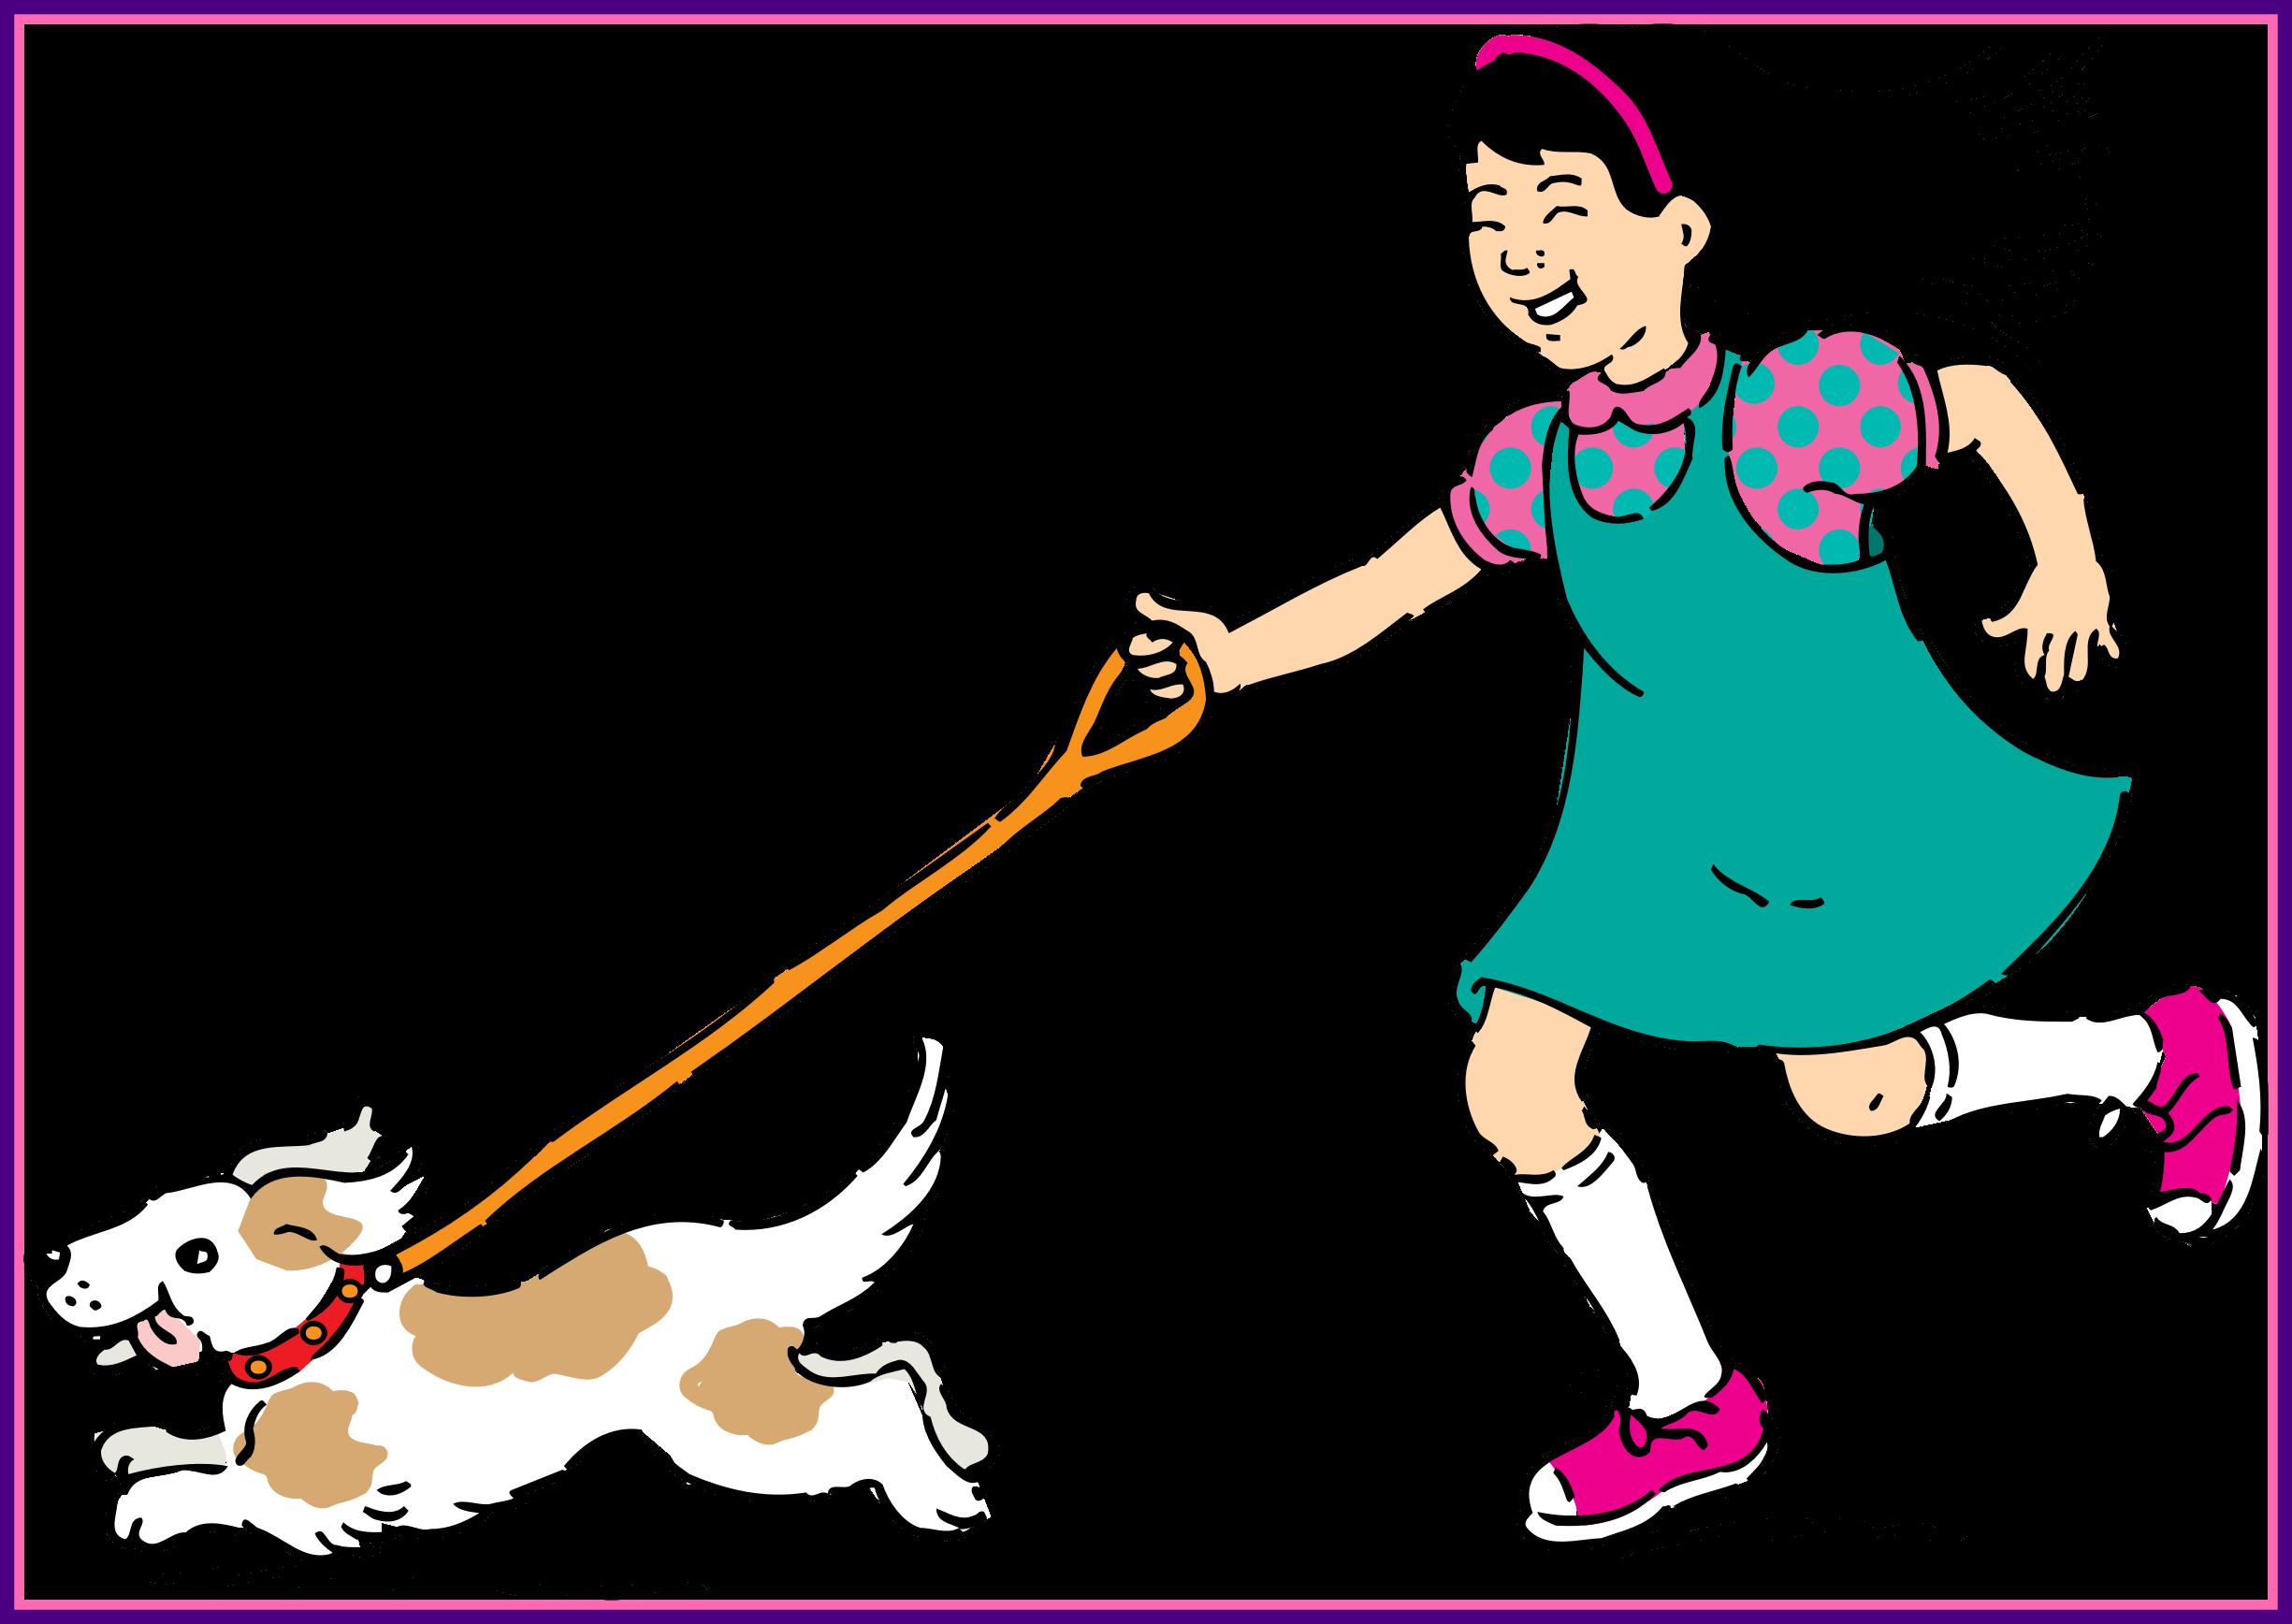 Clipart walking sponsored walk. Fascinating dog for cartoon